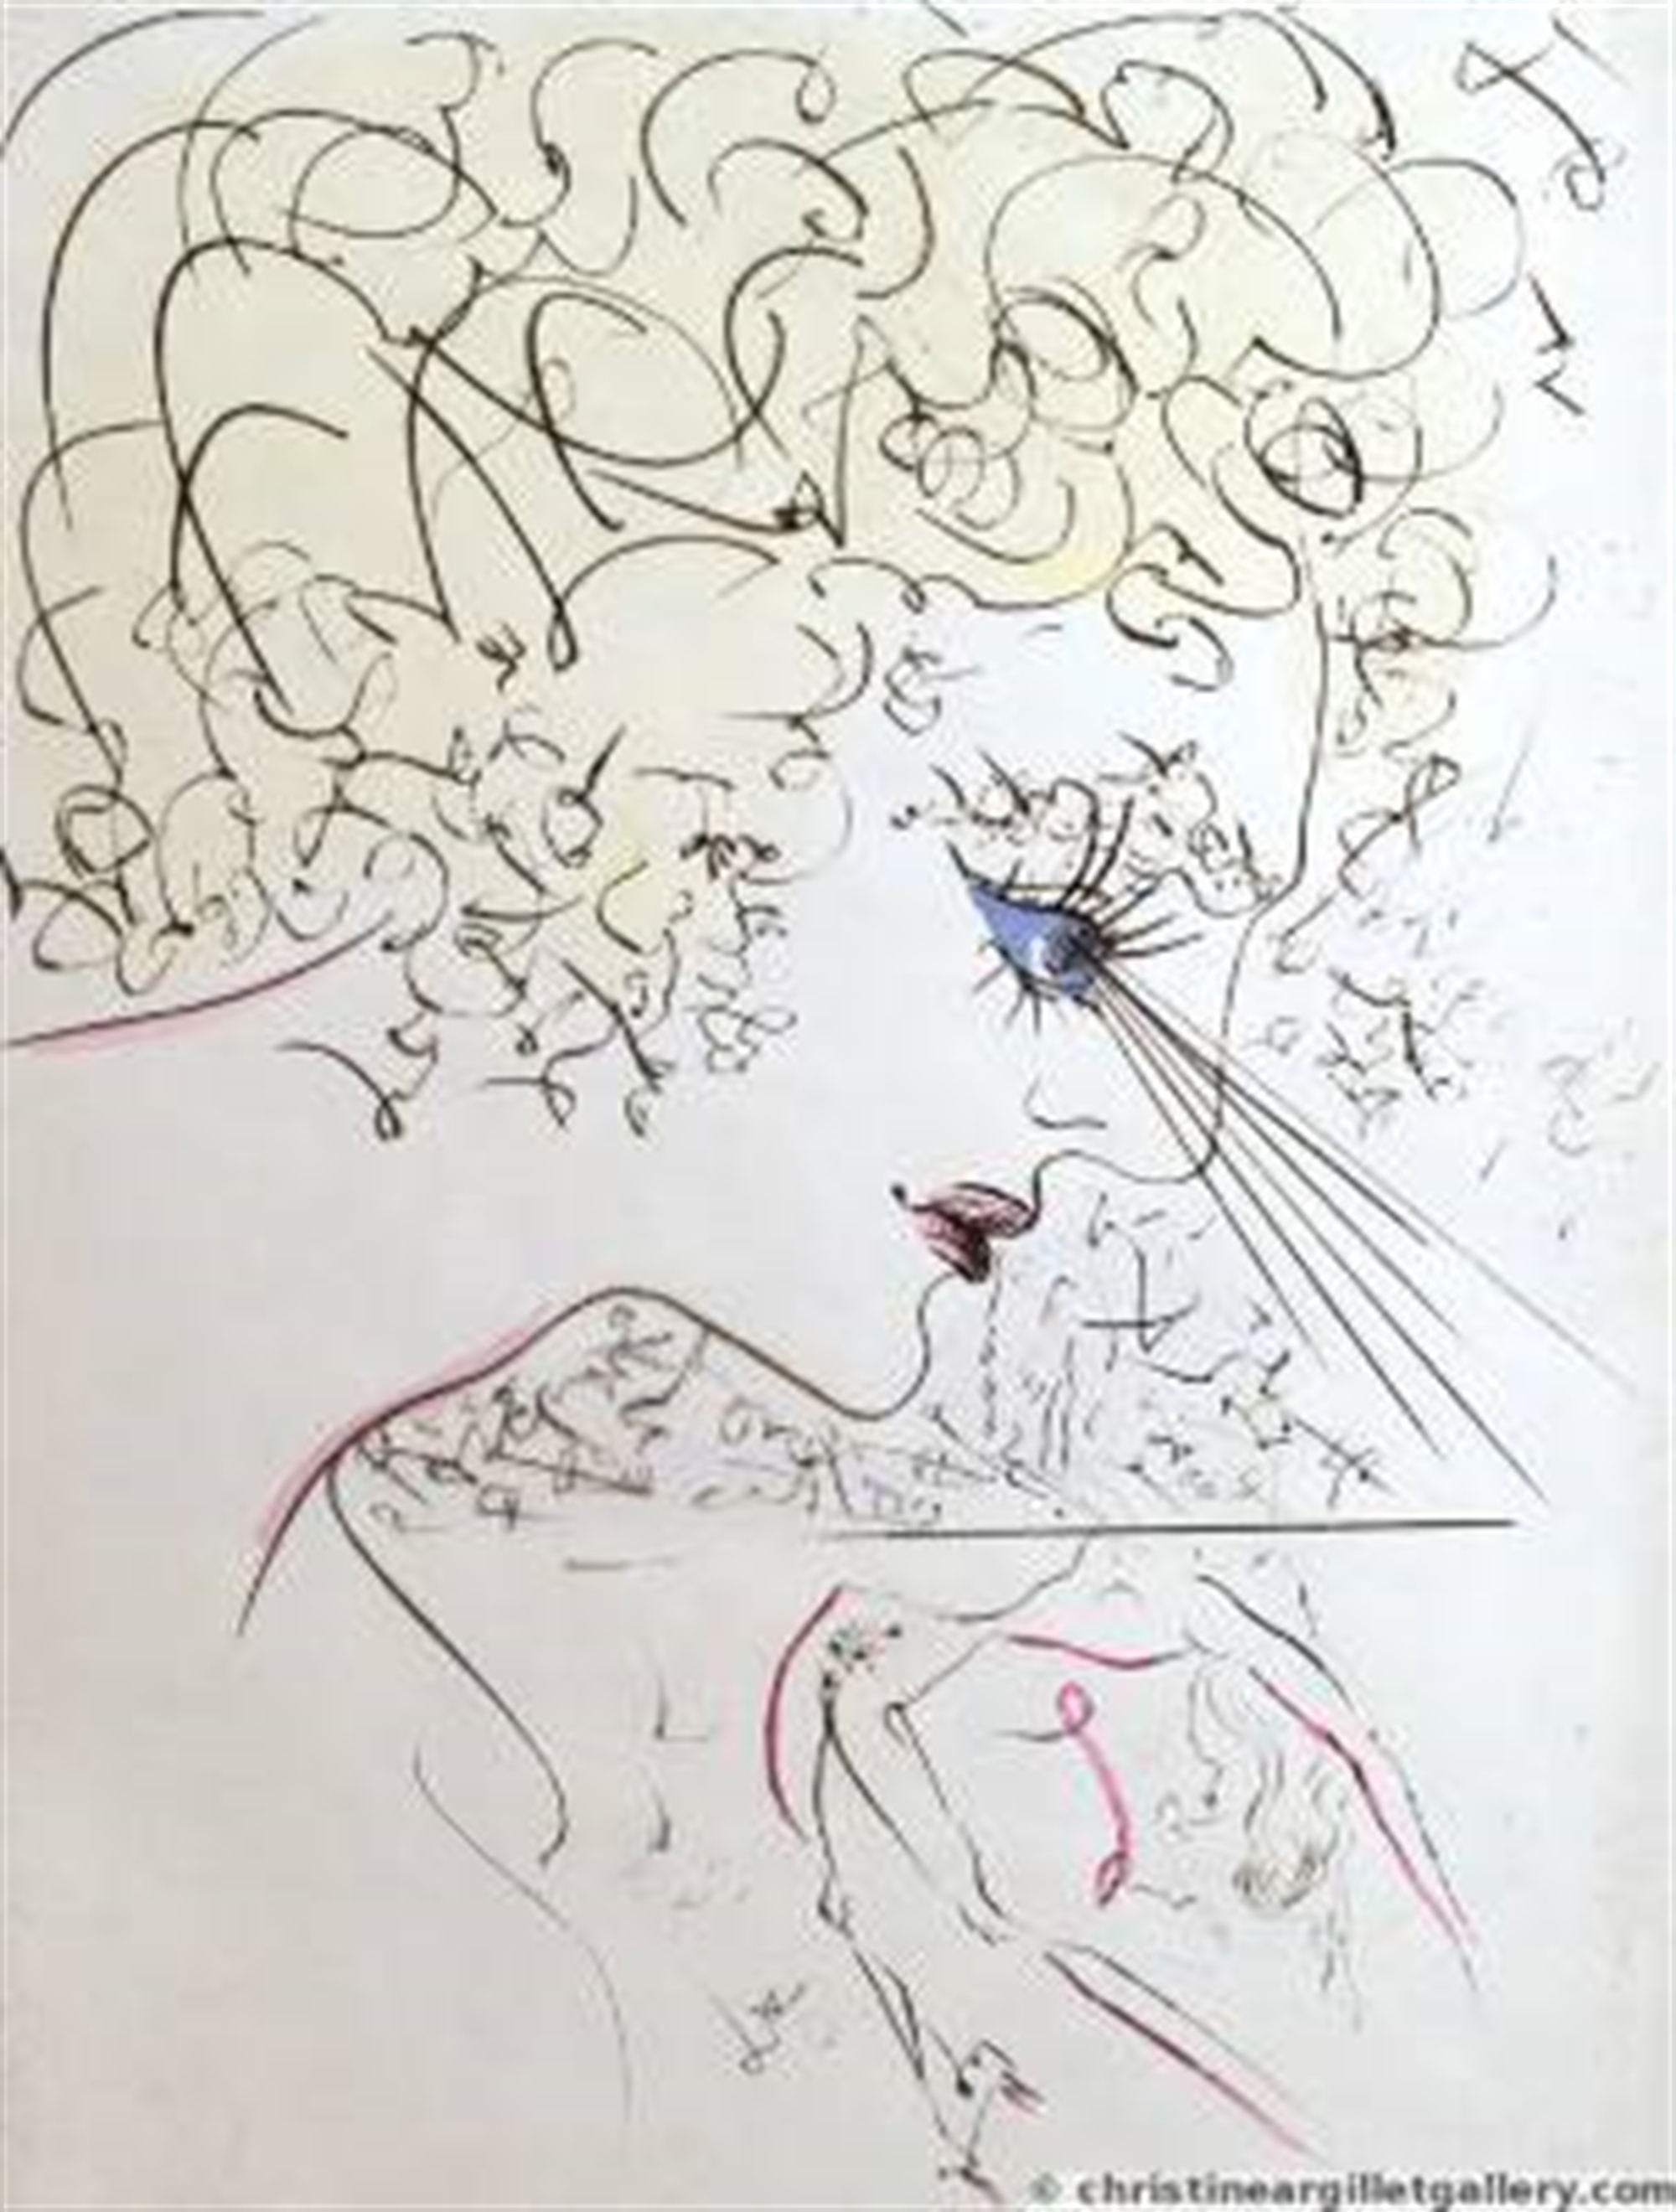 "Venus in Furs ""The Head"" by Salvador Dali"